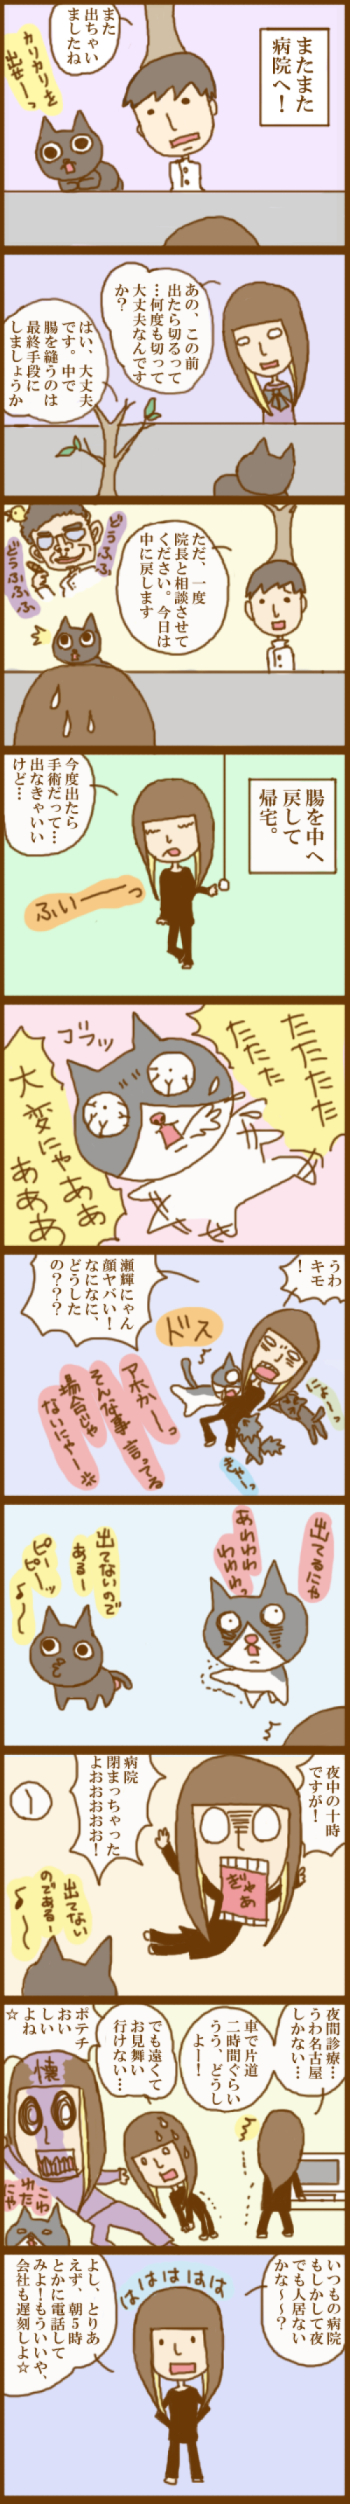 f:id:suzuokayu:20201116114431j:plain